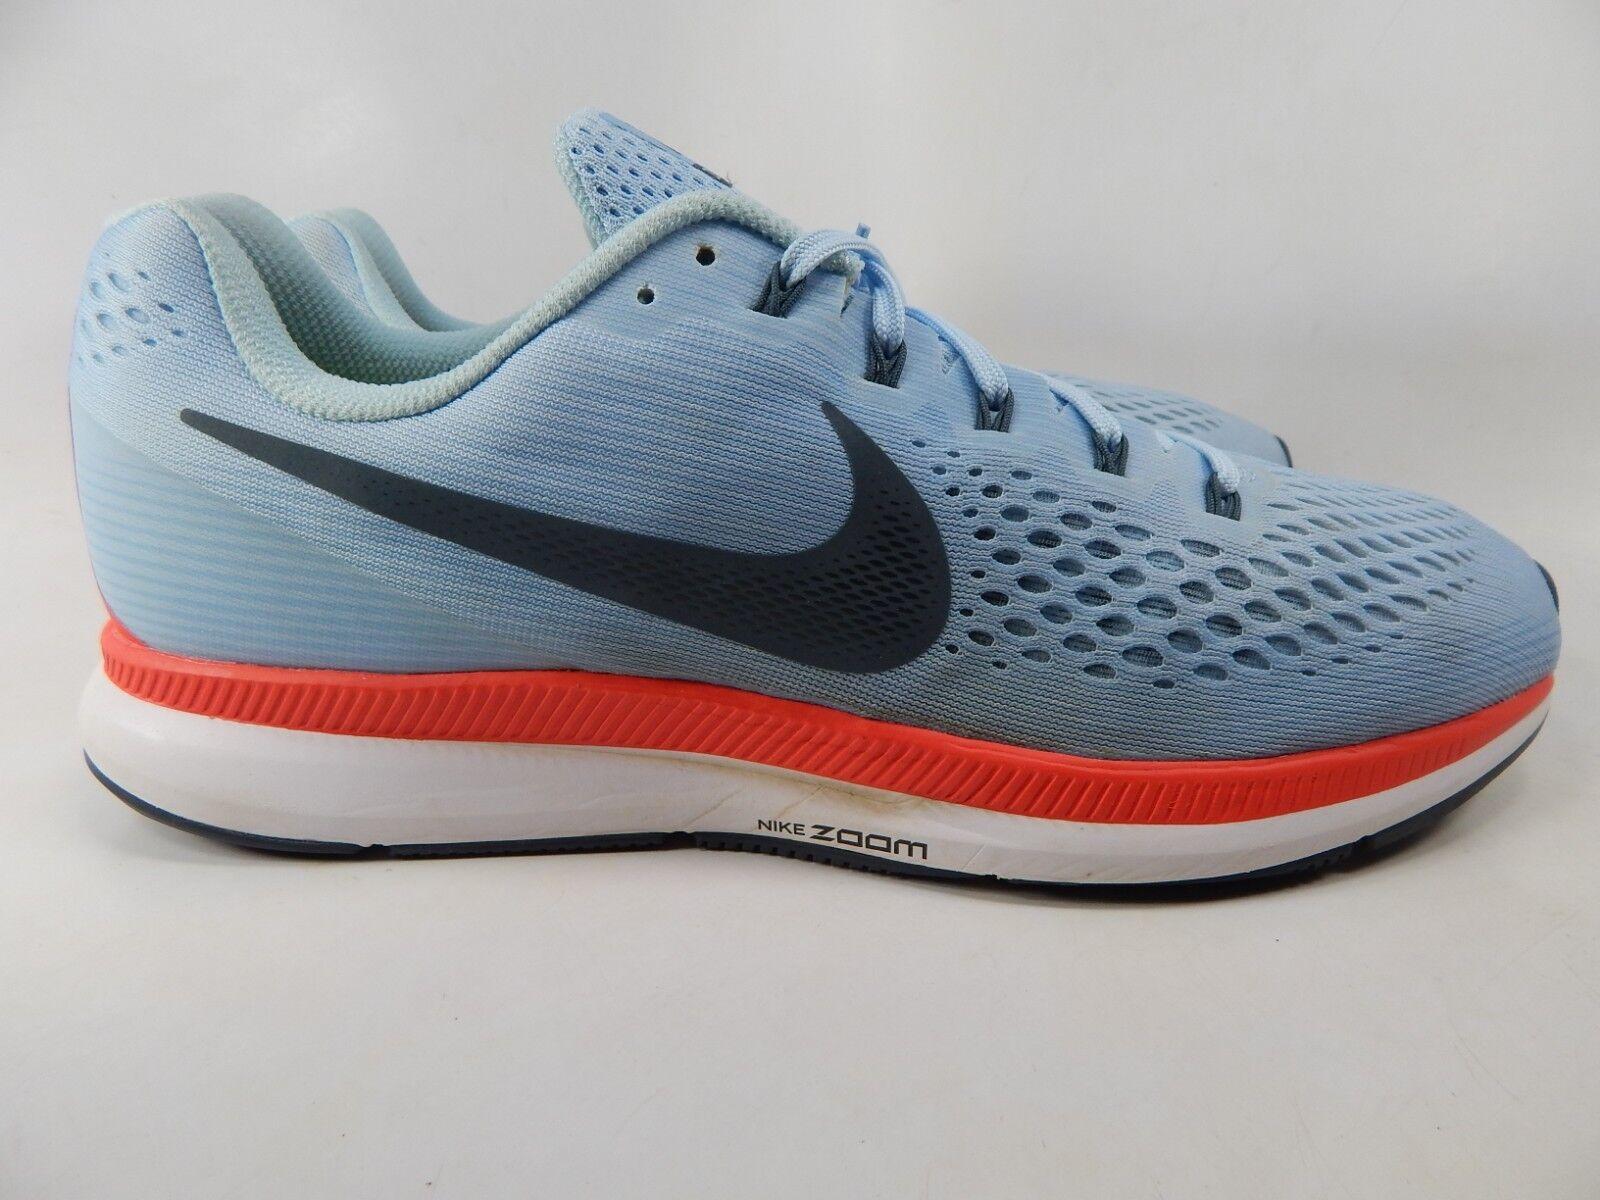 Nike Air Zoom Pegasus 34 Size 13 M (D) EU 47.5 Men's 'Ice bluee' shoes 880555-404